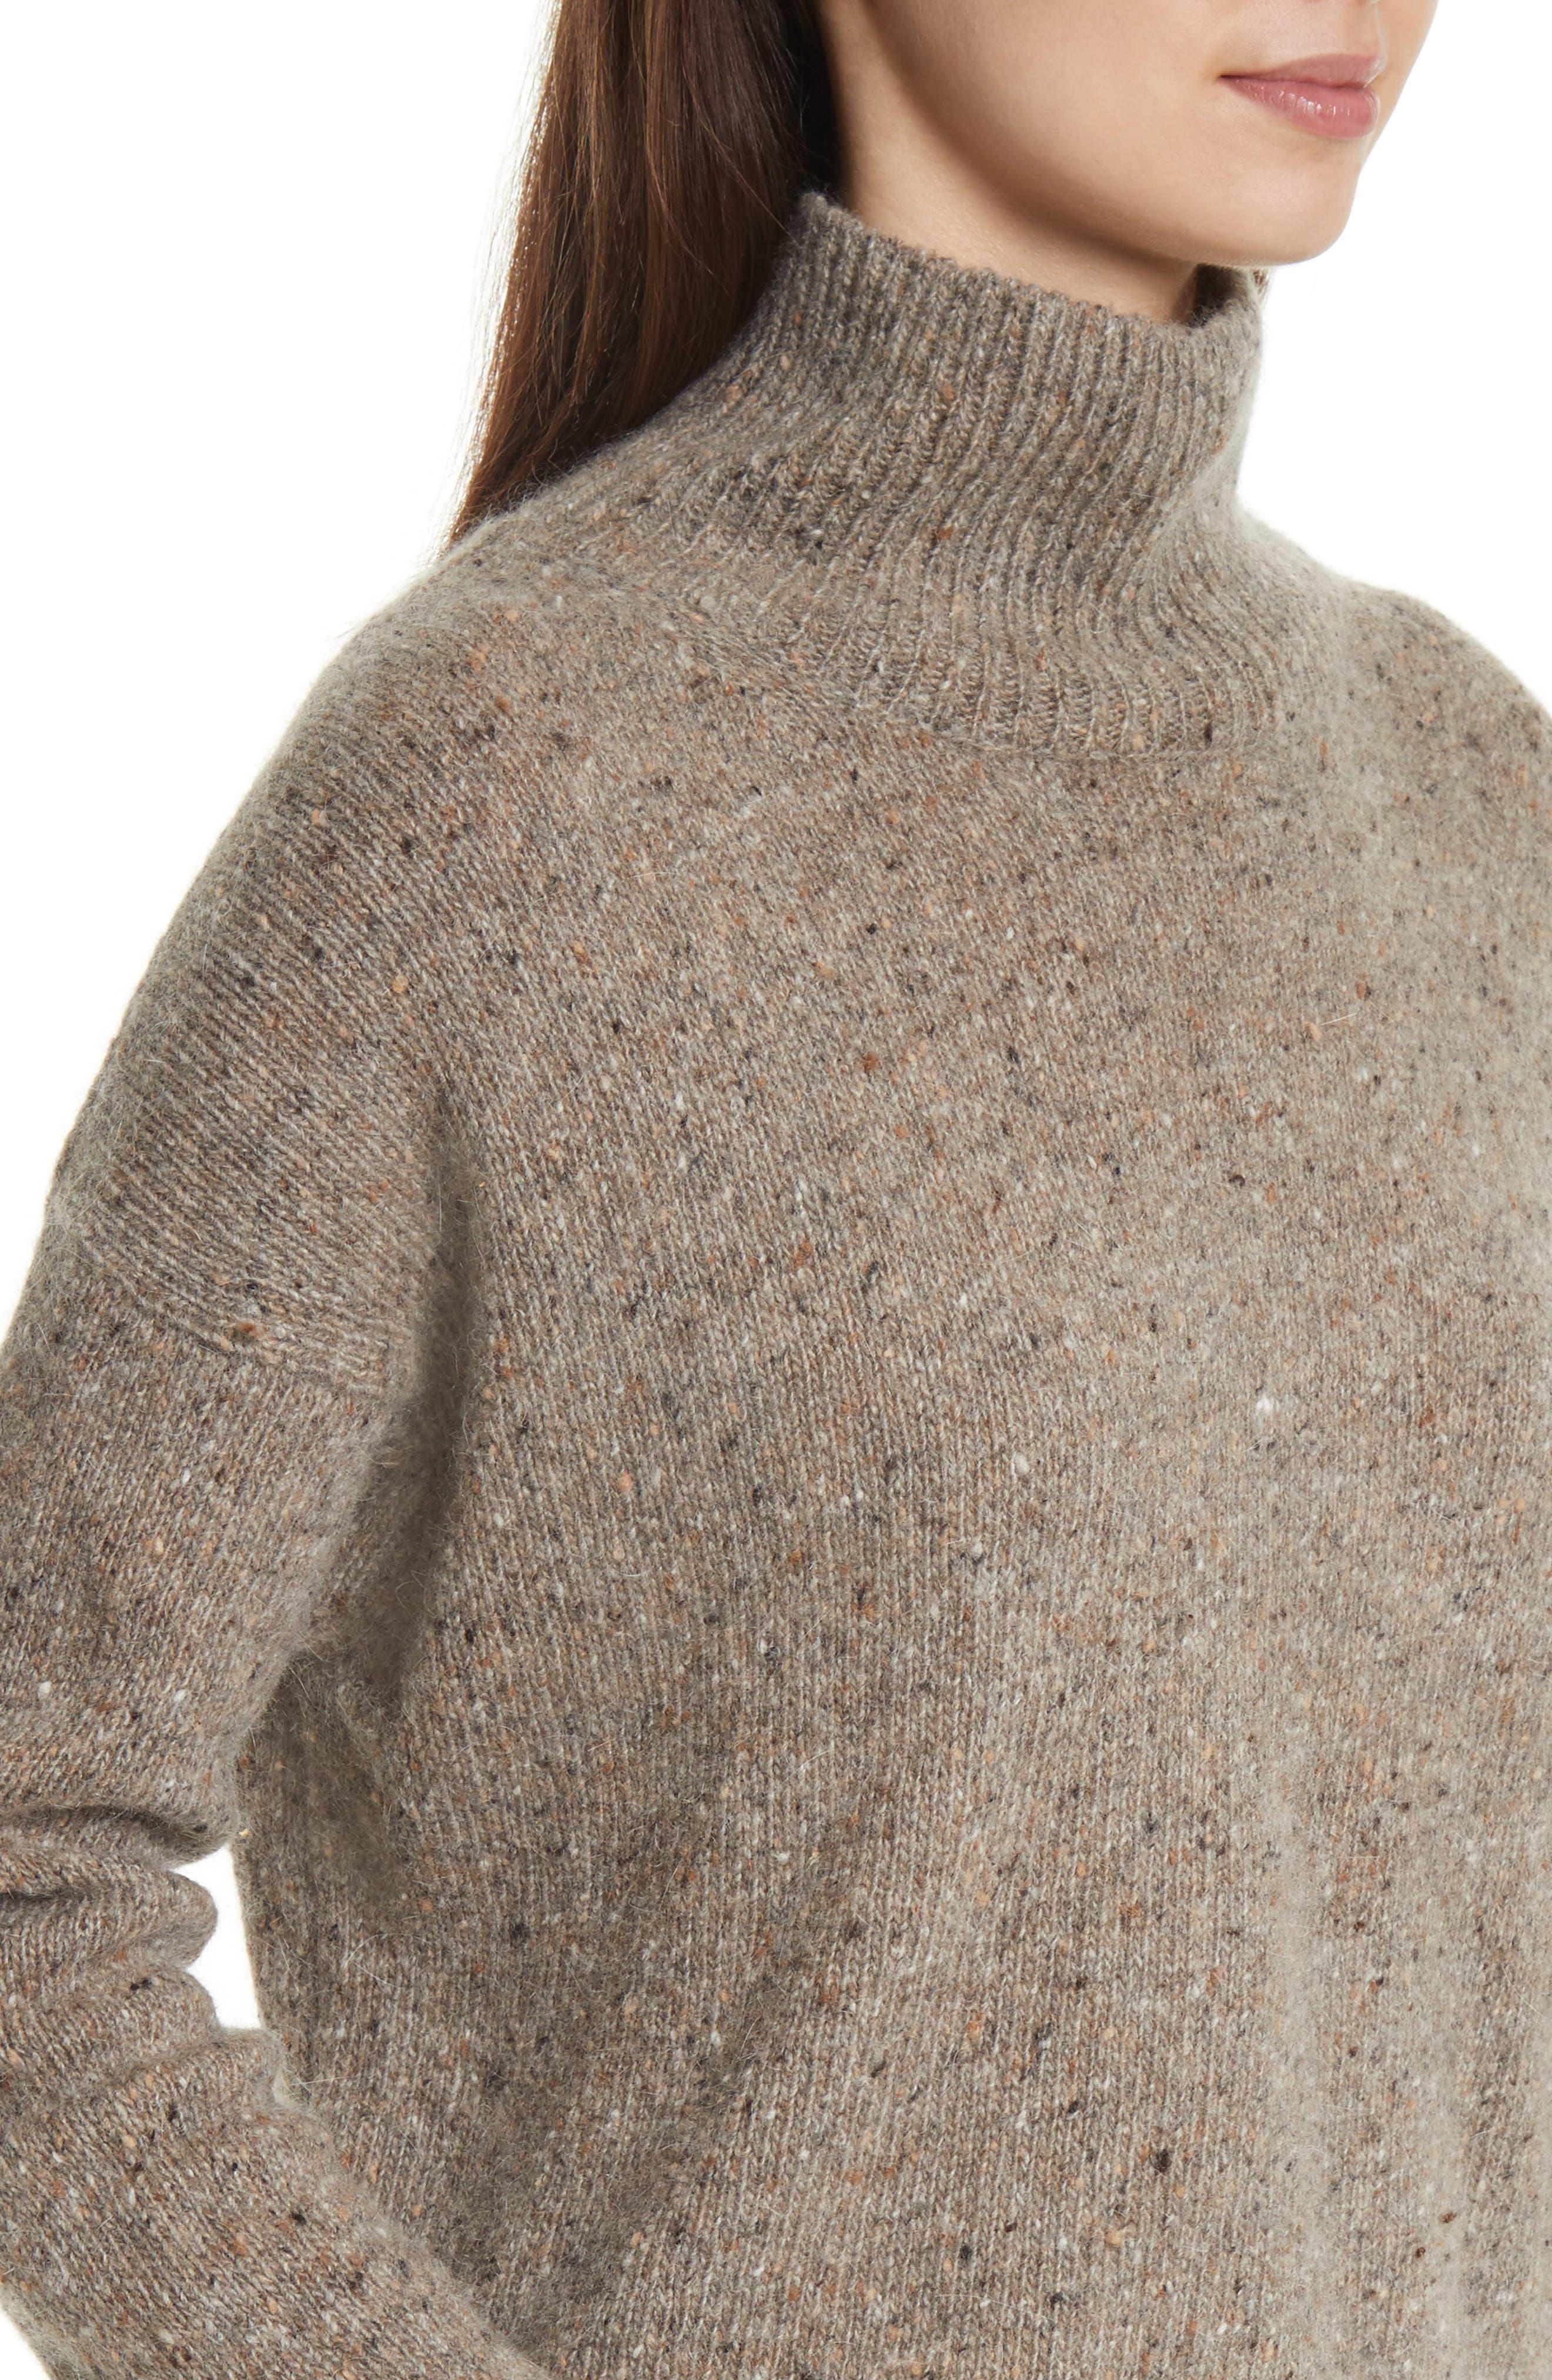 Cashmere Turtleneck Sweater,                             Alternate thumbnail 8, color,